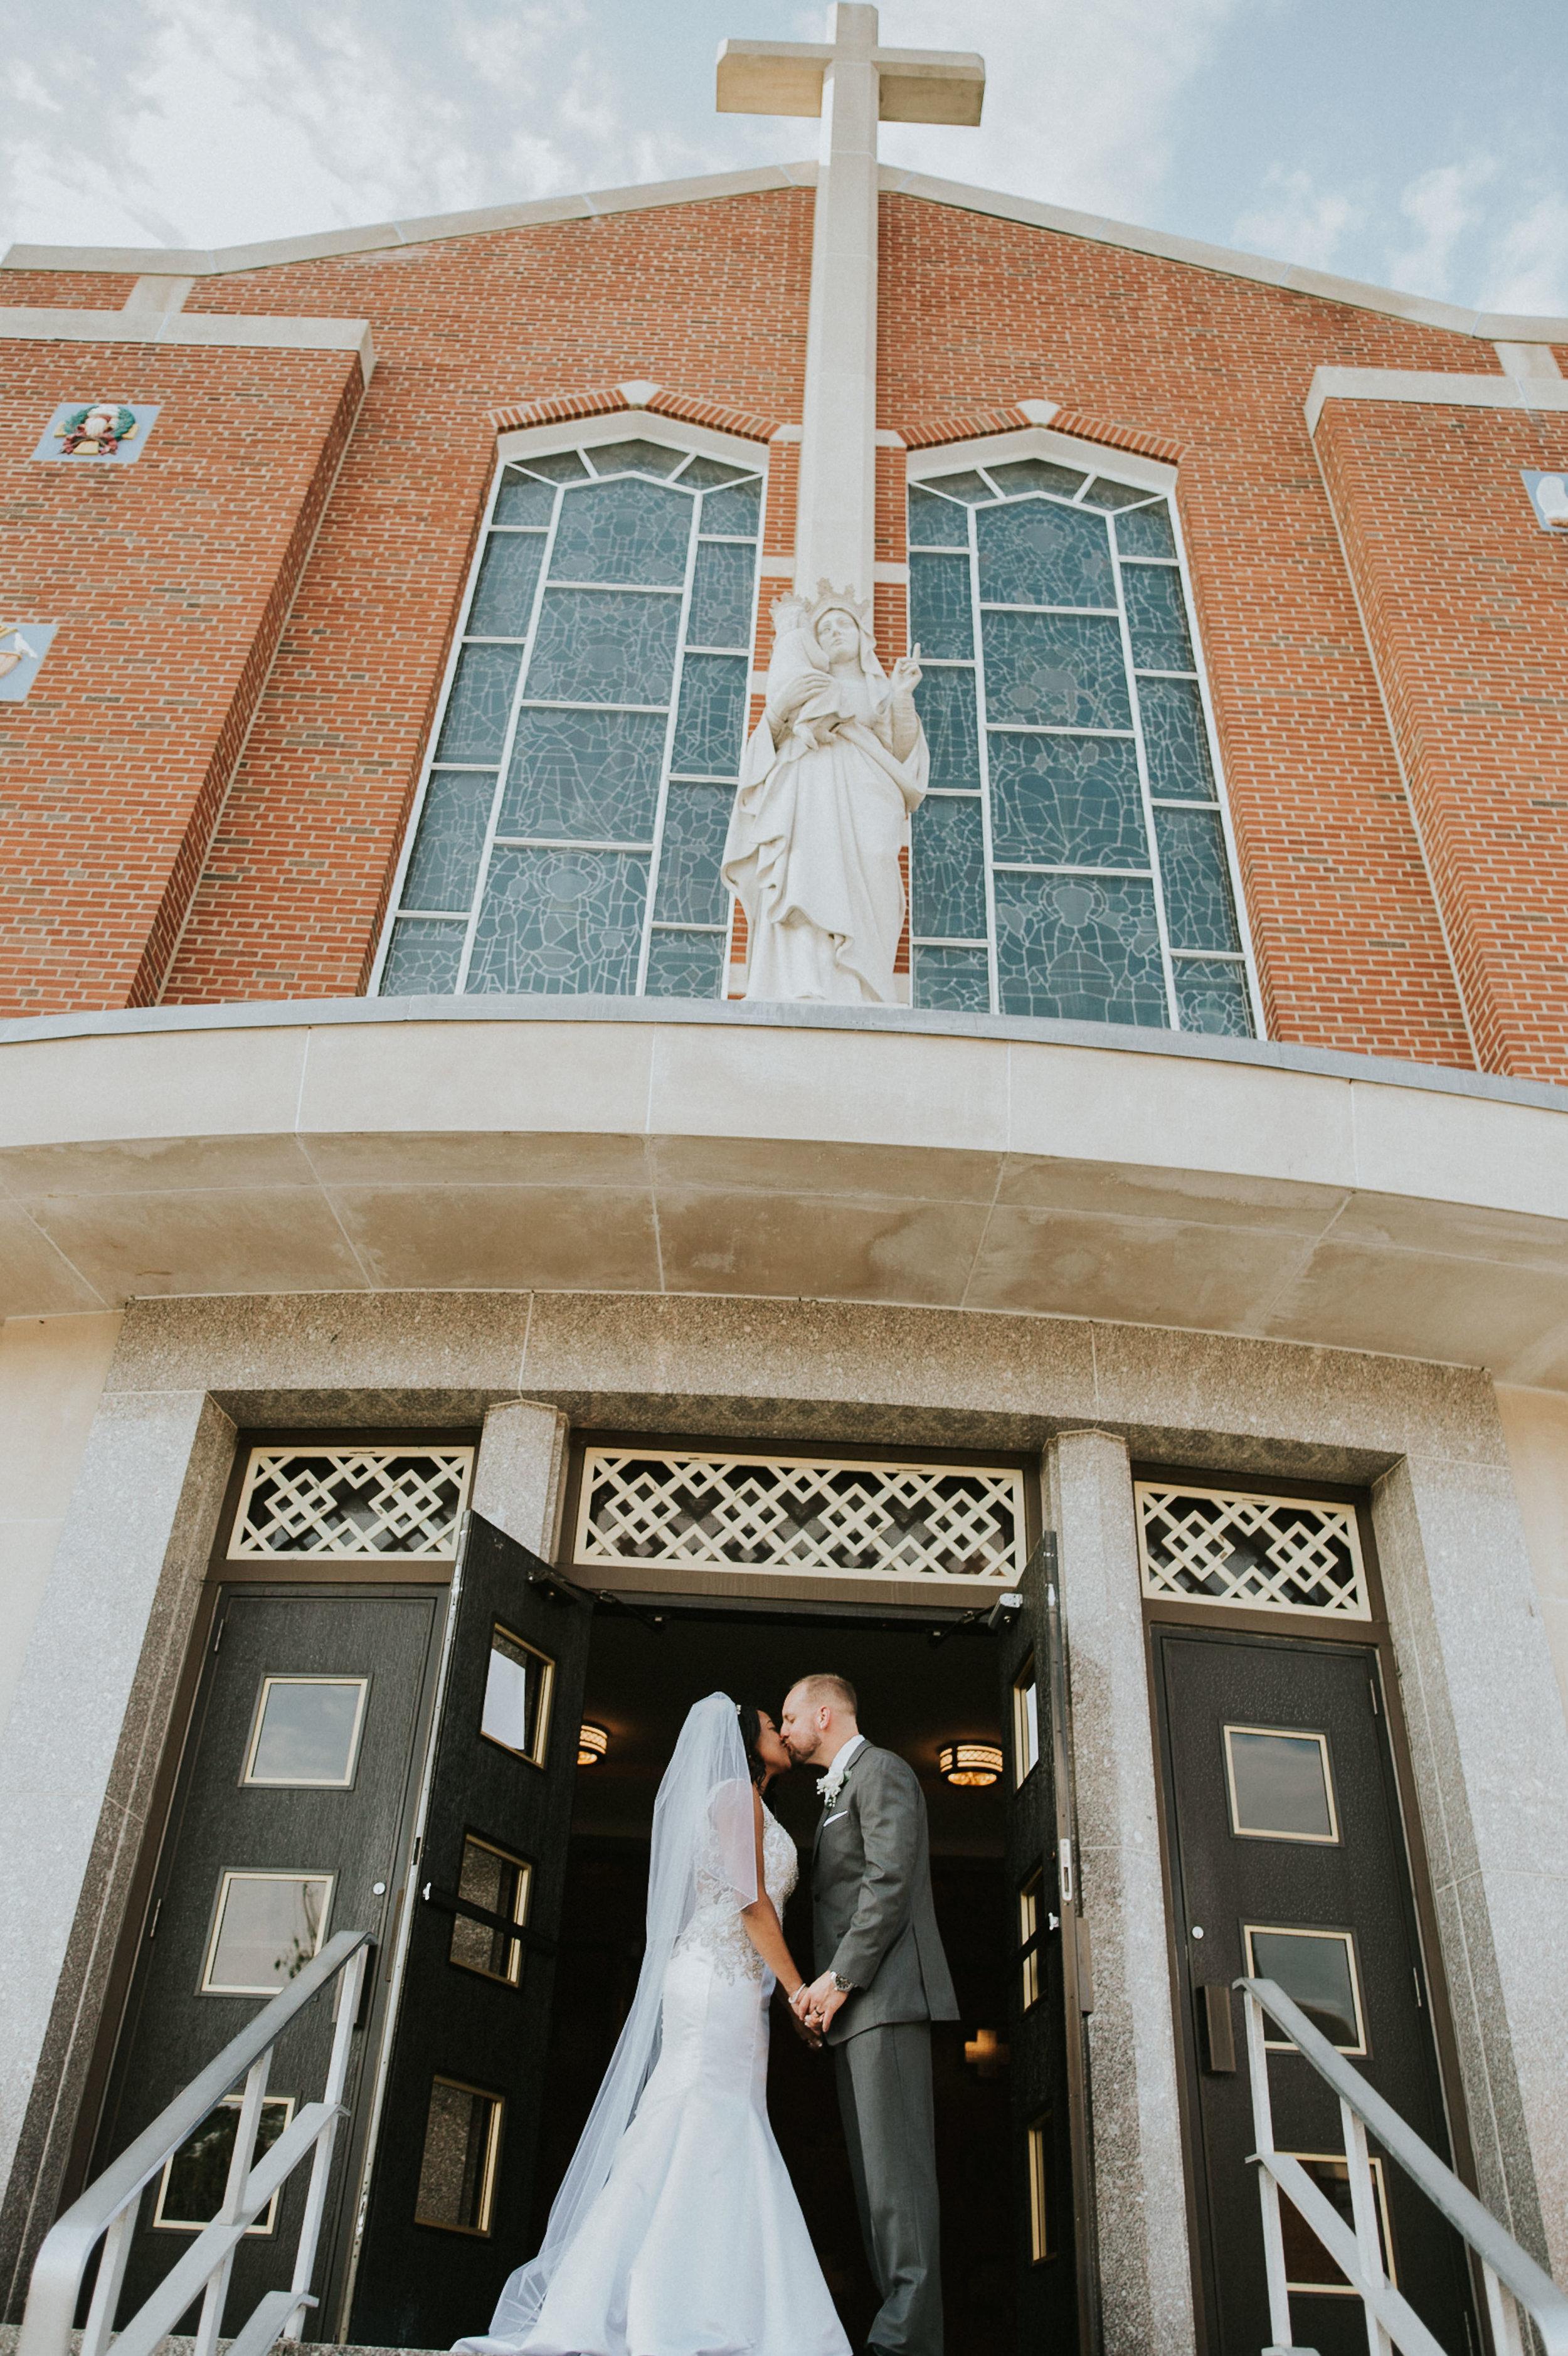 Tiana-and-Danny-Wedding-558.jpg